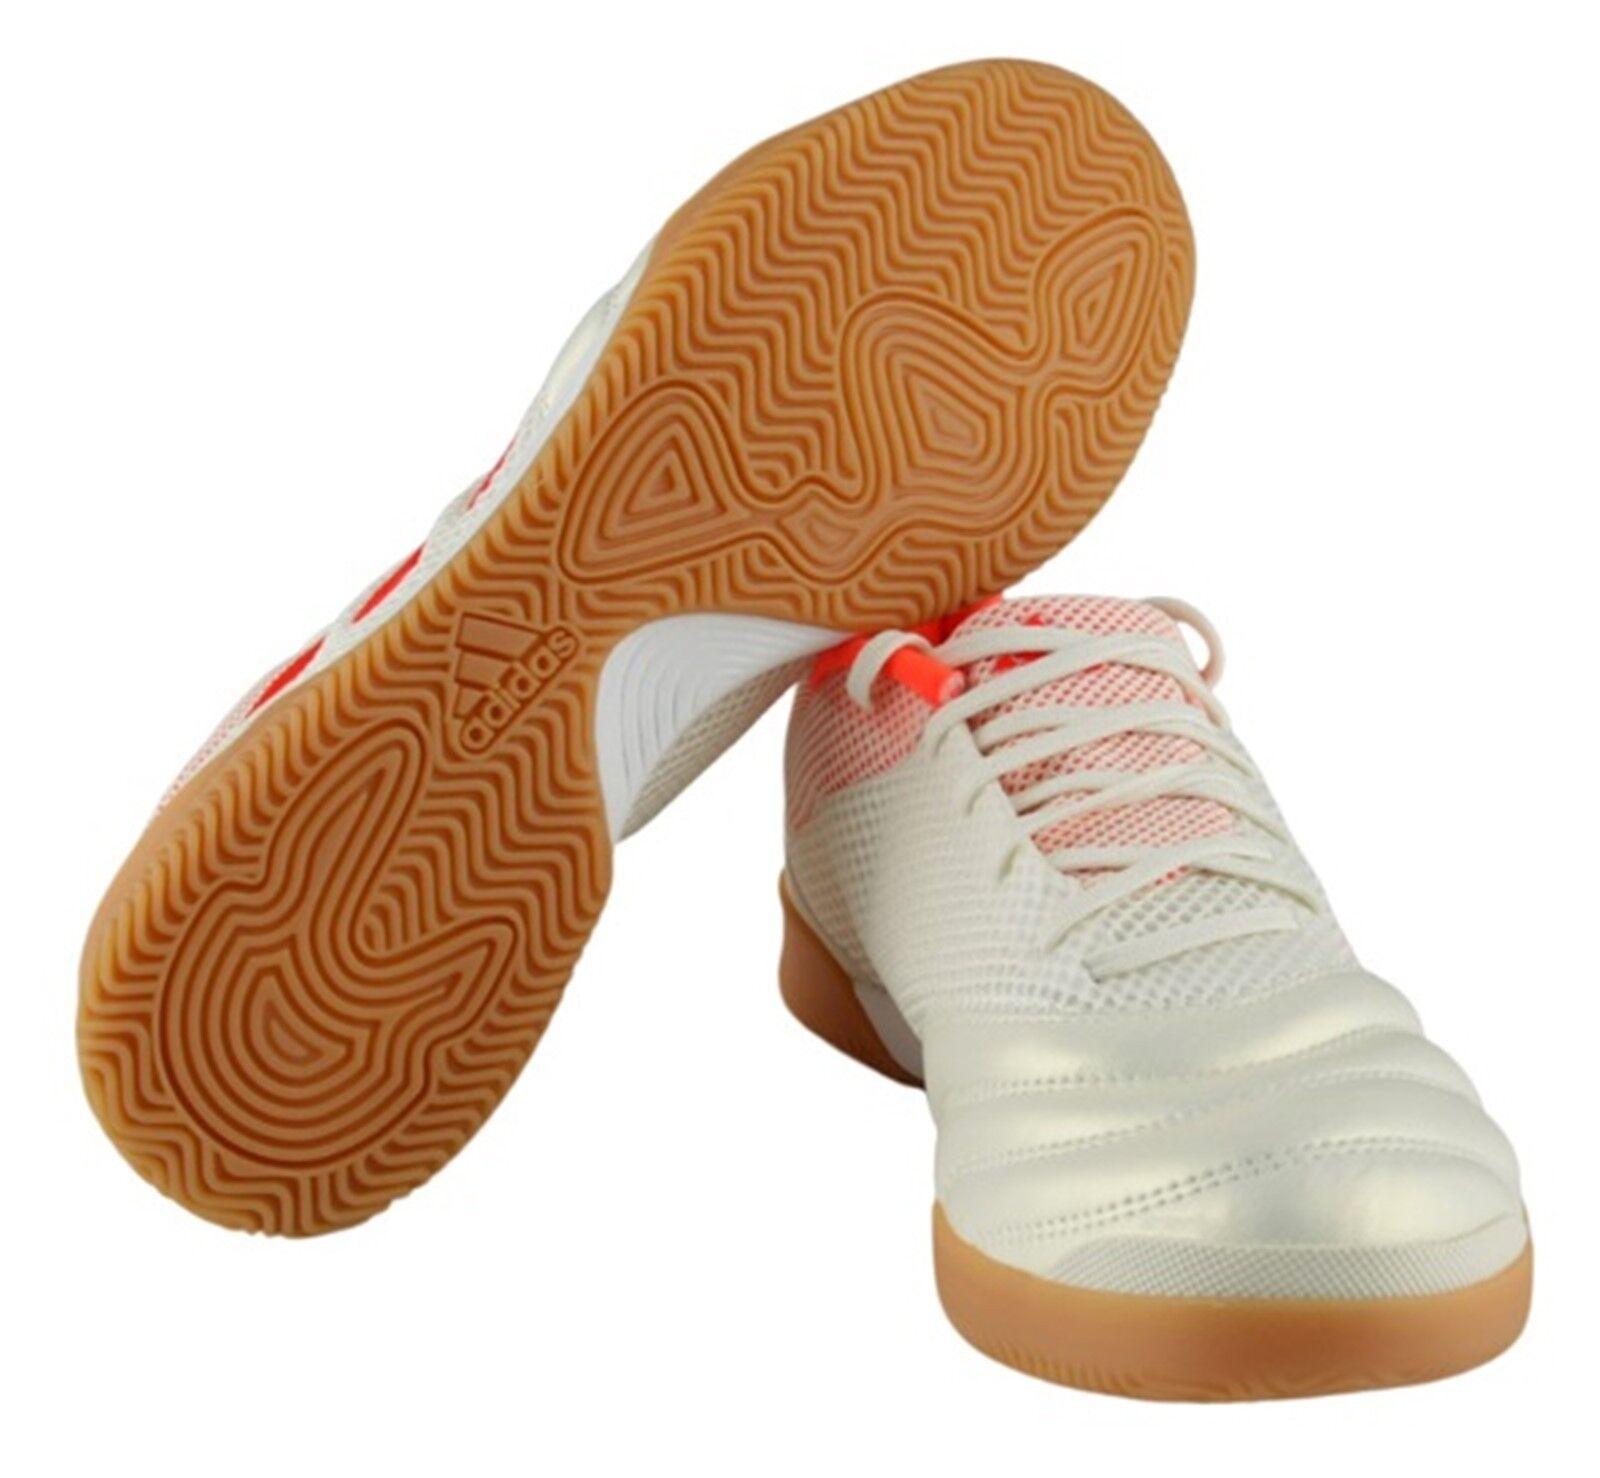 Adidas Men COPA 19.3 IN Sala Indoor Weiß Soccer Futsal schuhe Stiefel schuhe D98065